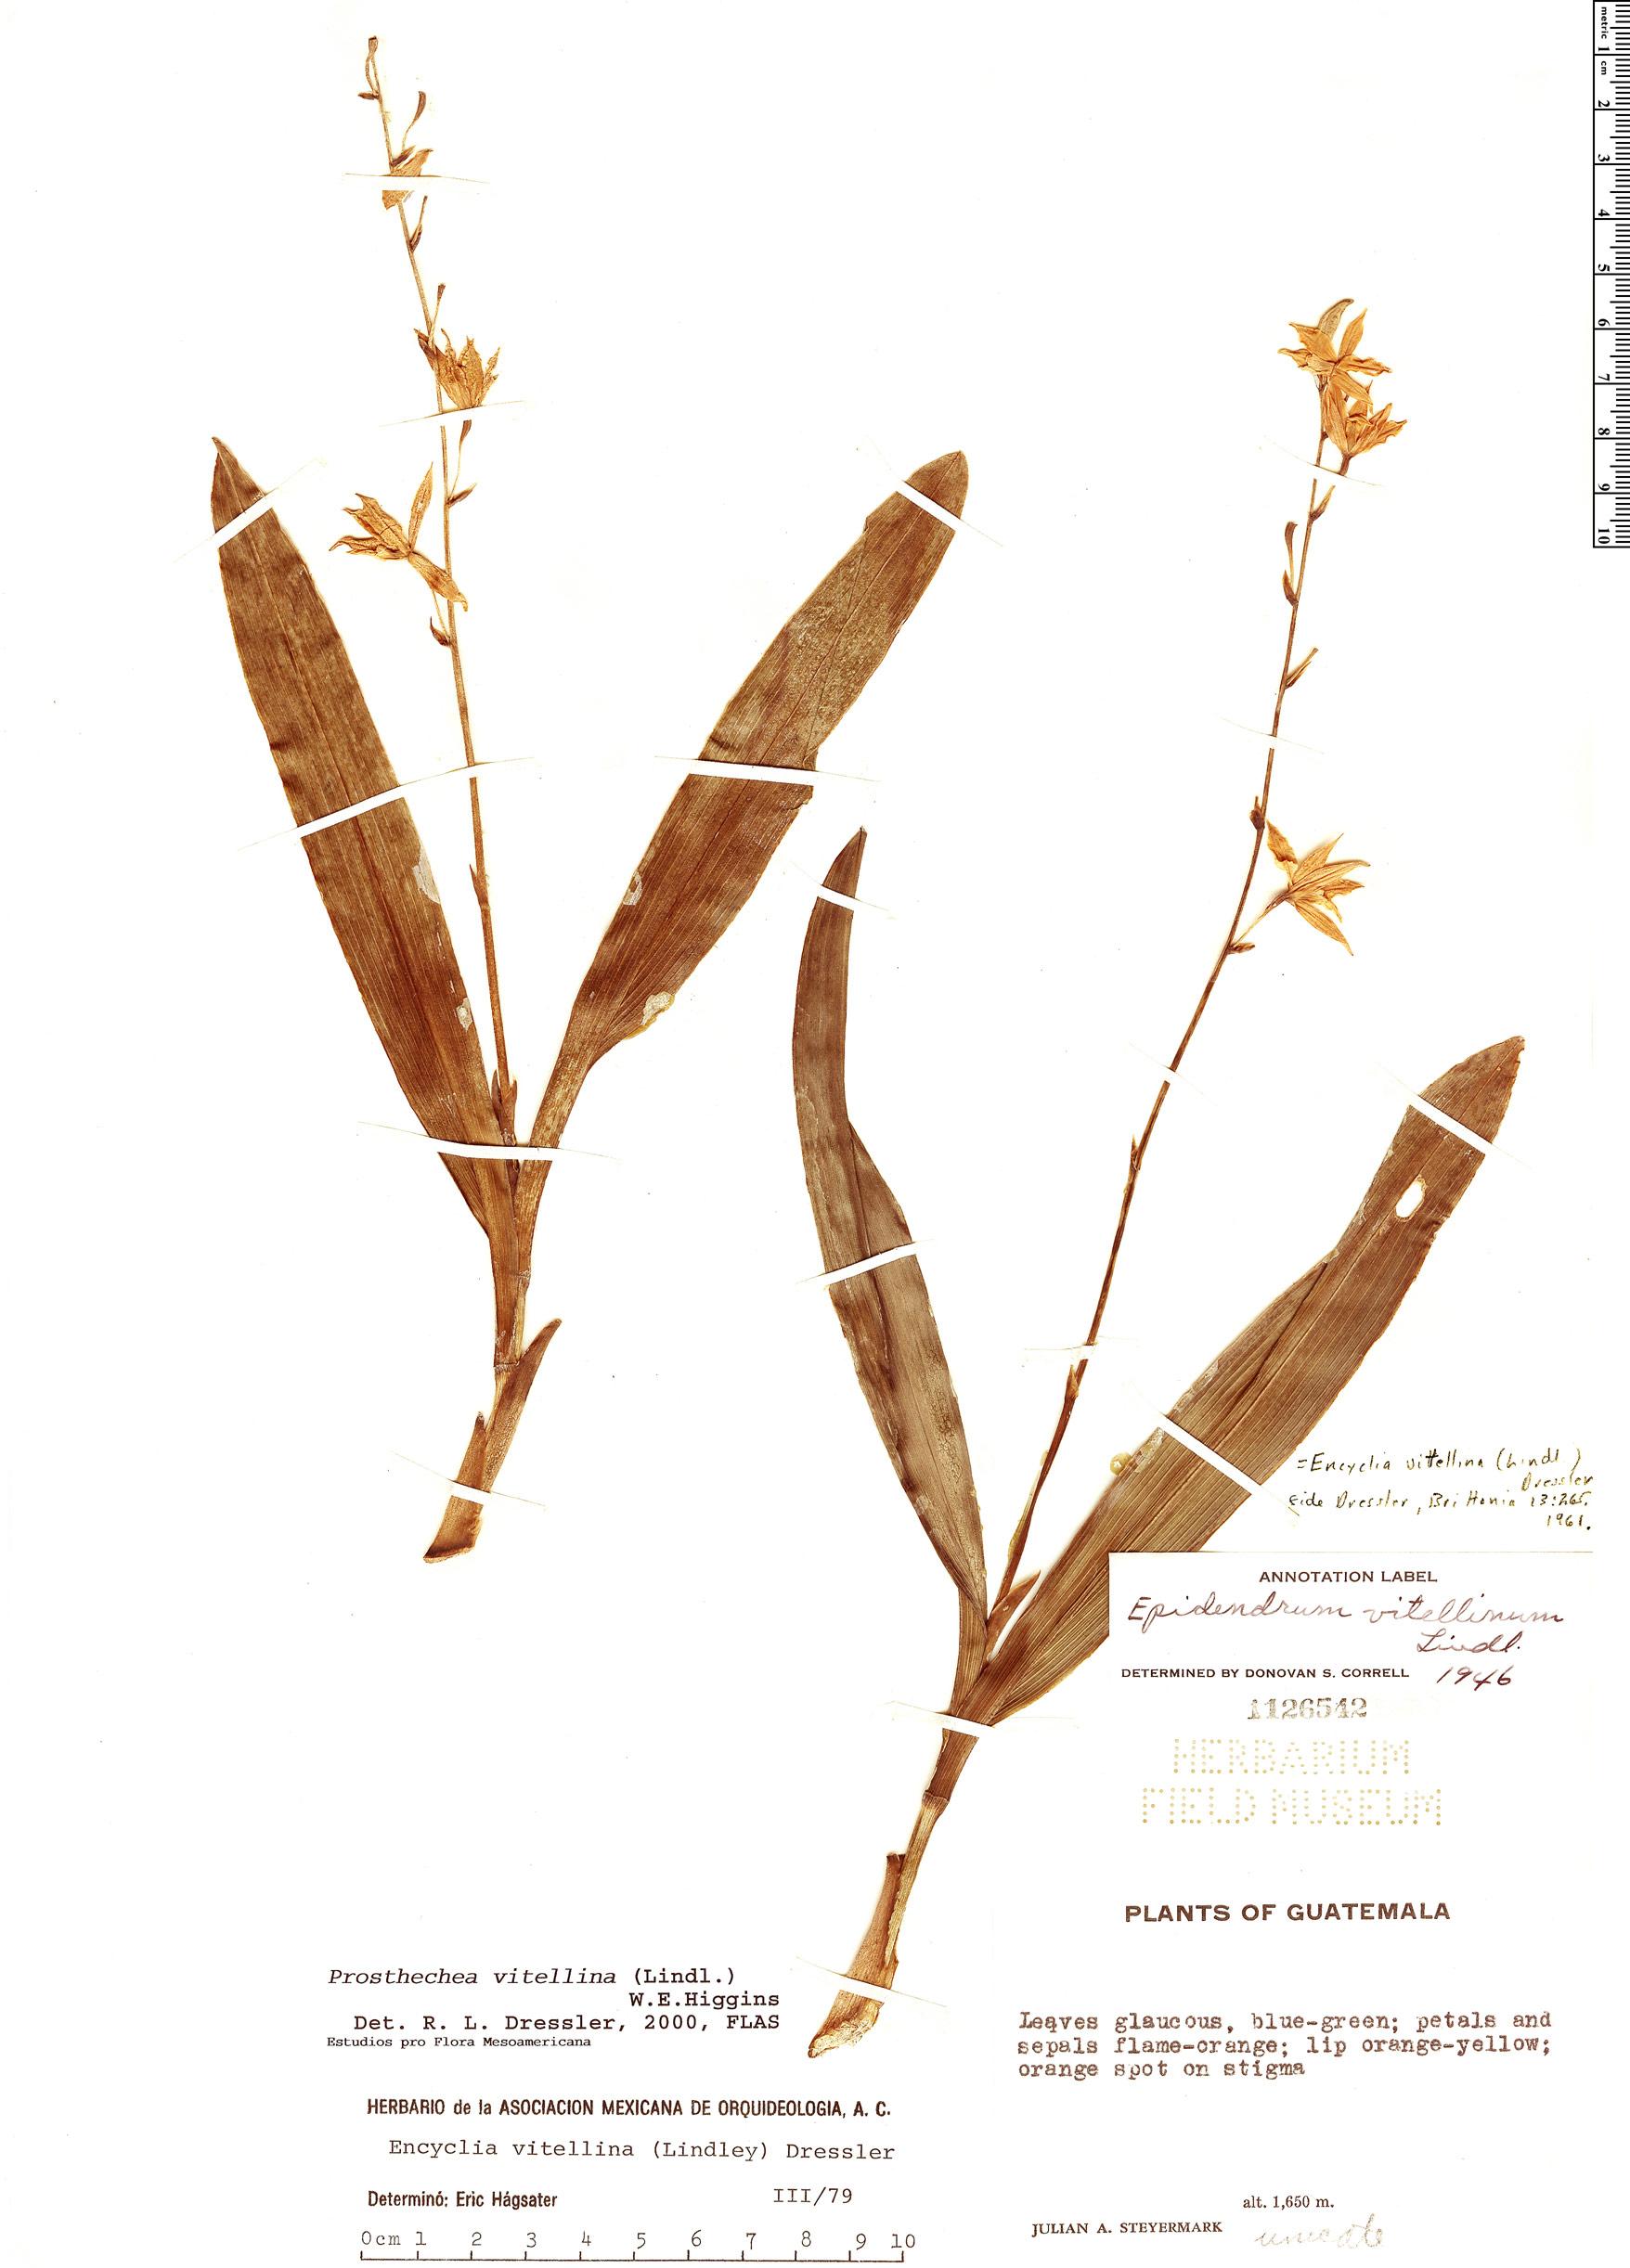 Specimen: Prosthechea vitellina